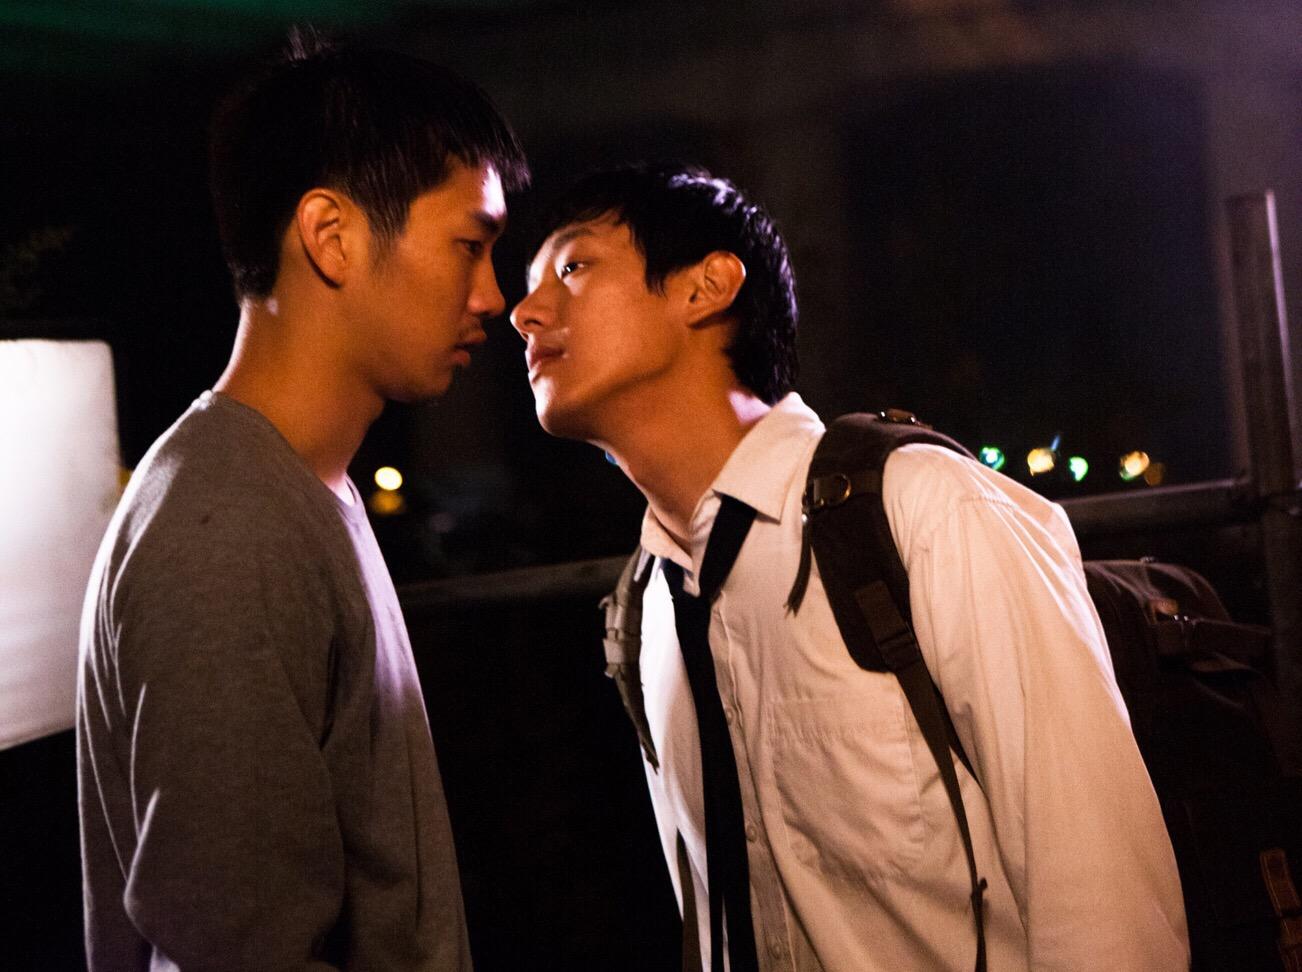 Cerita panas indonesia khusus gay